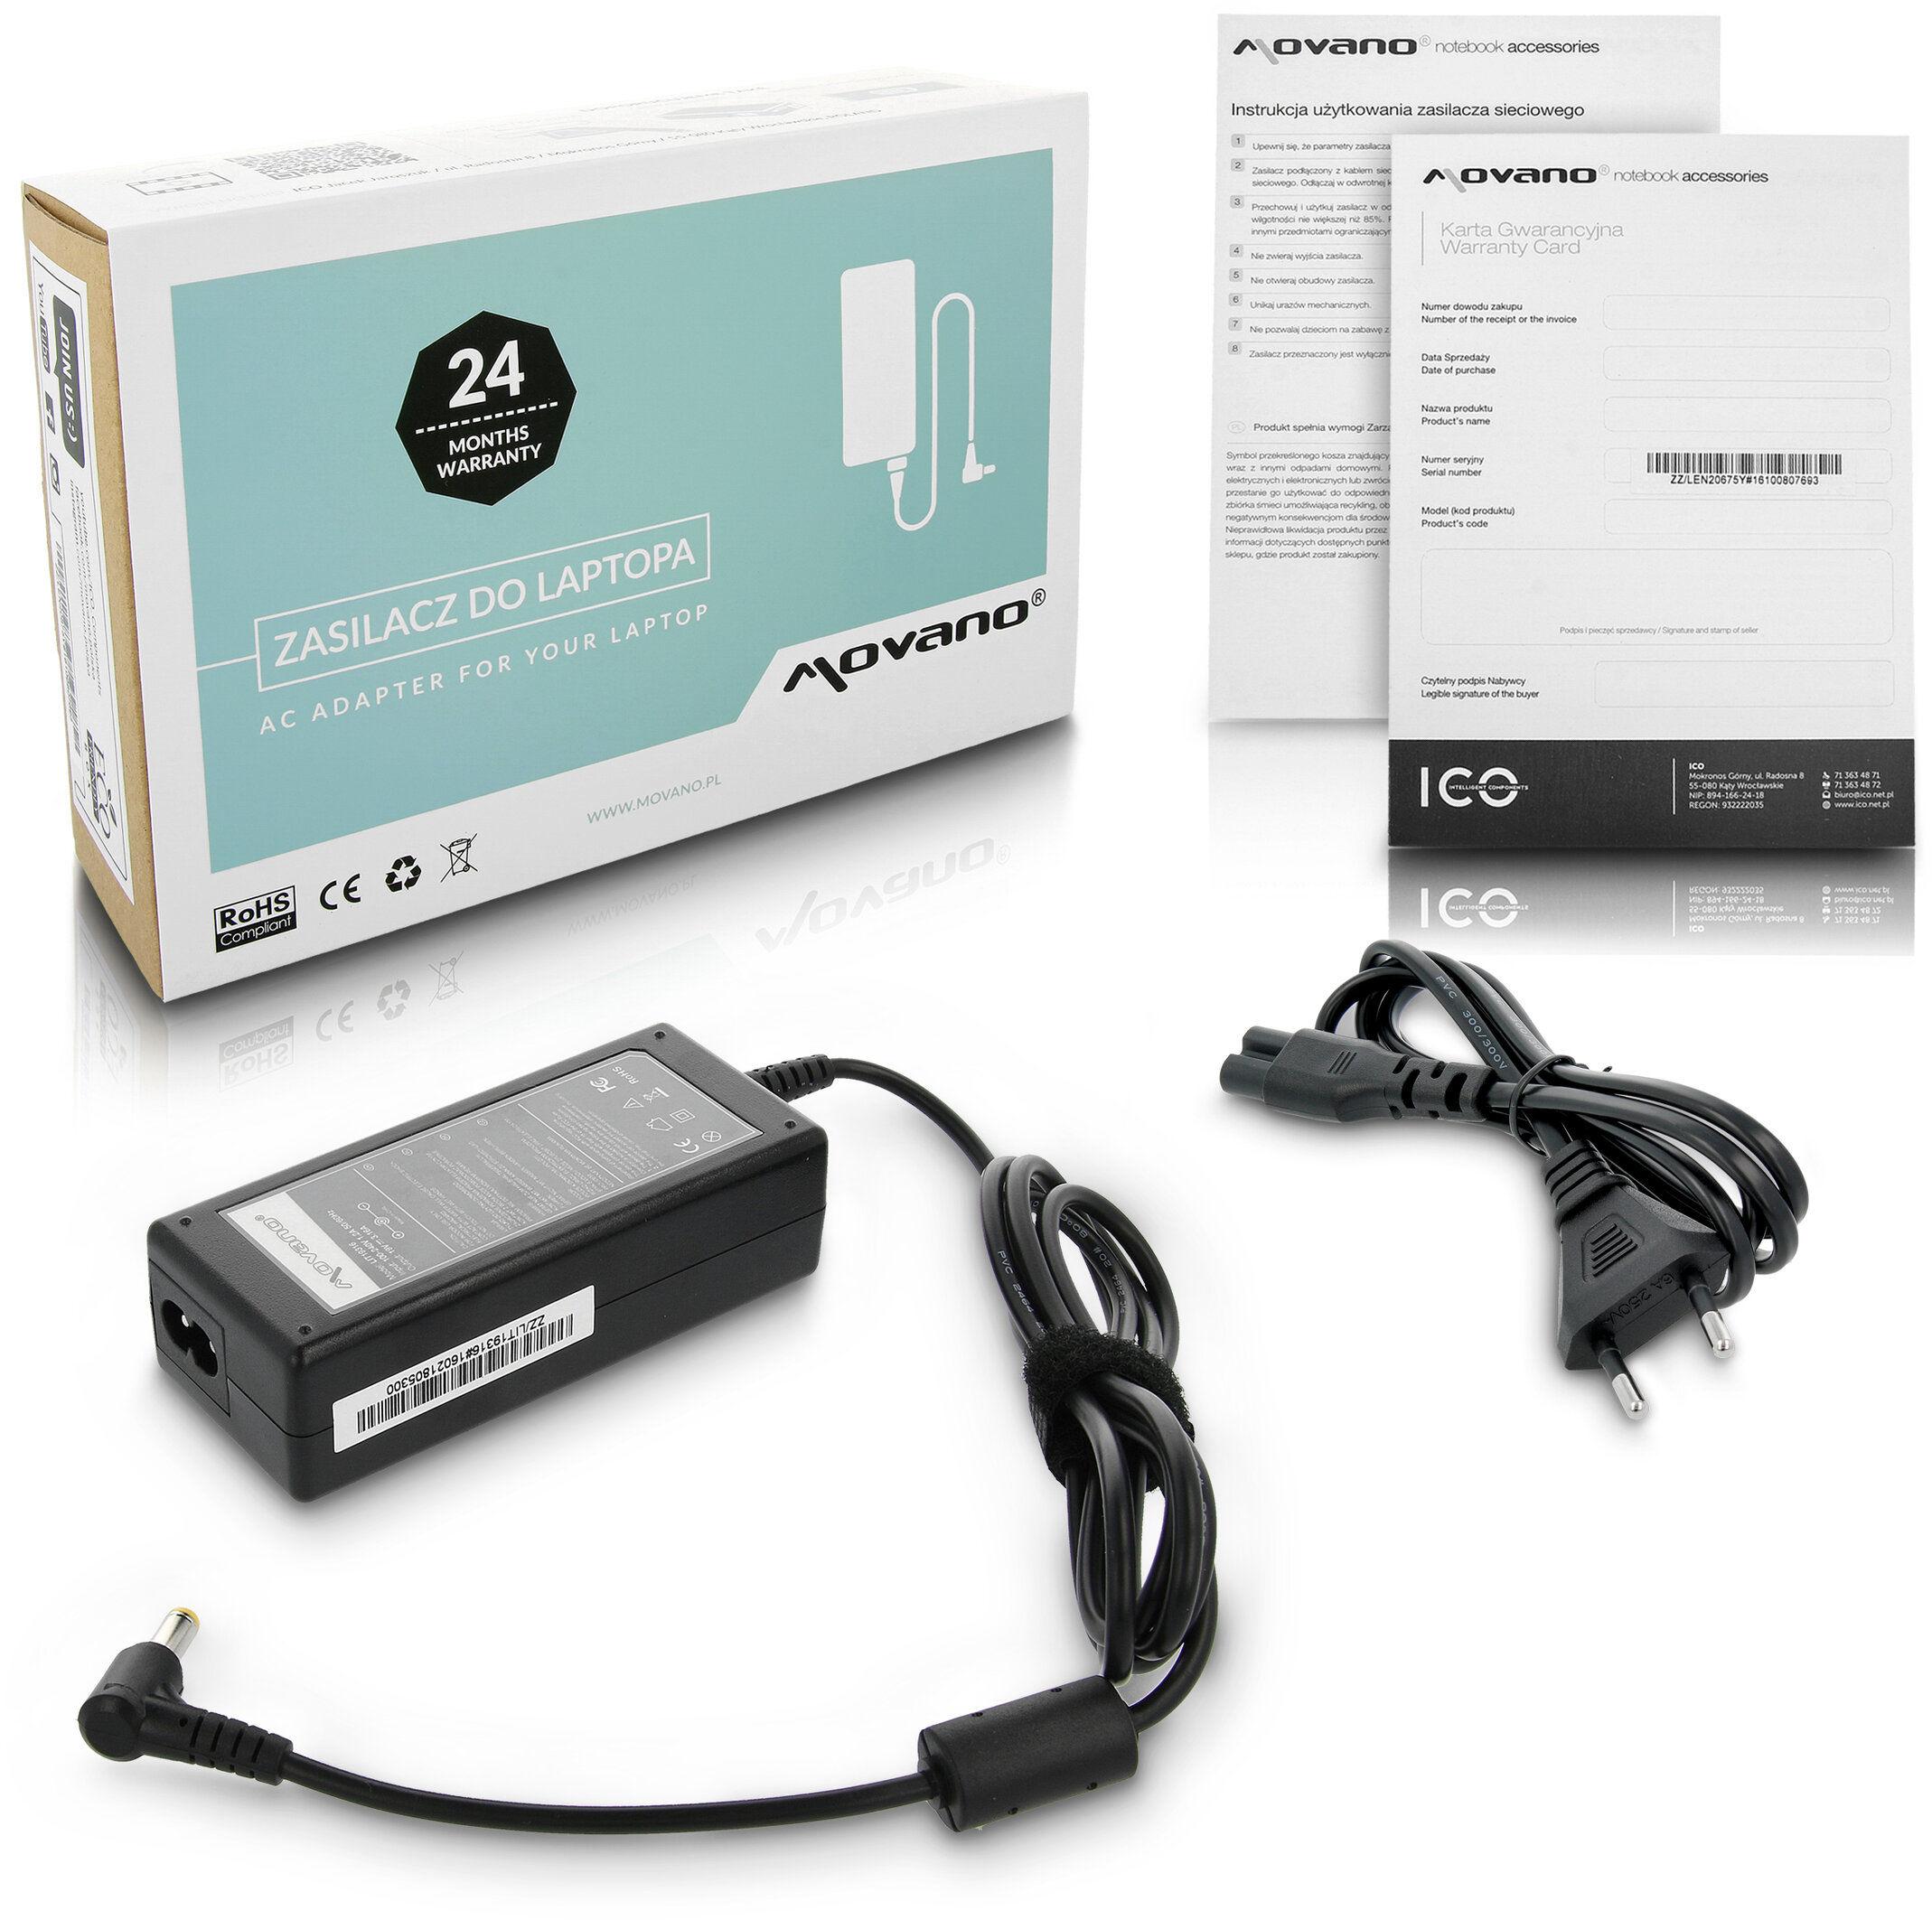 Zasilacz ładowarka do HP Omnibook 4111 4150 4150b 6000 6000b